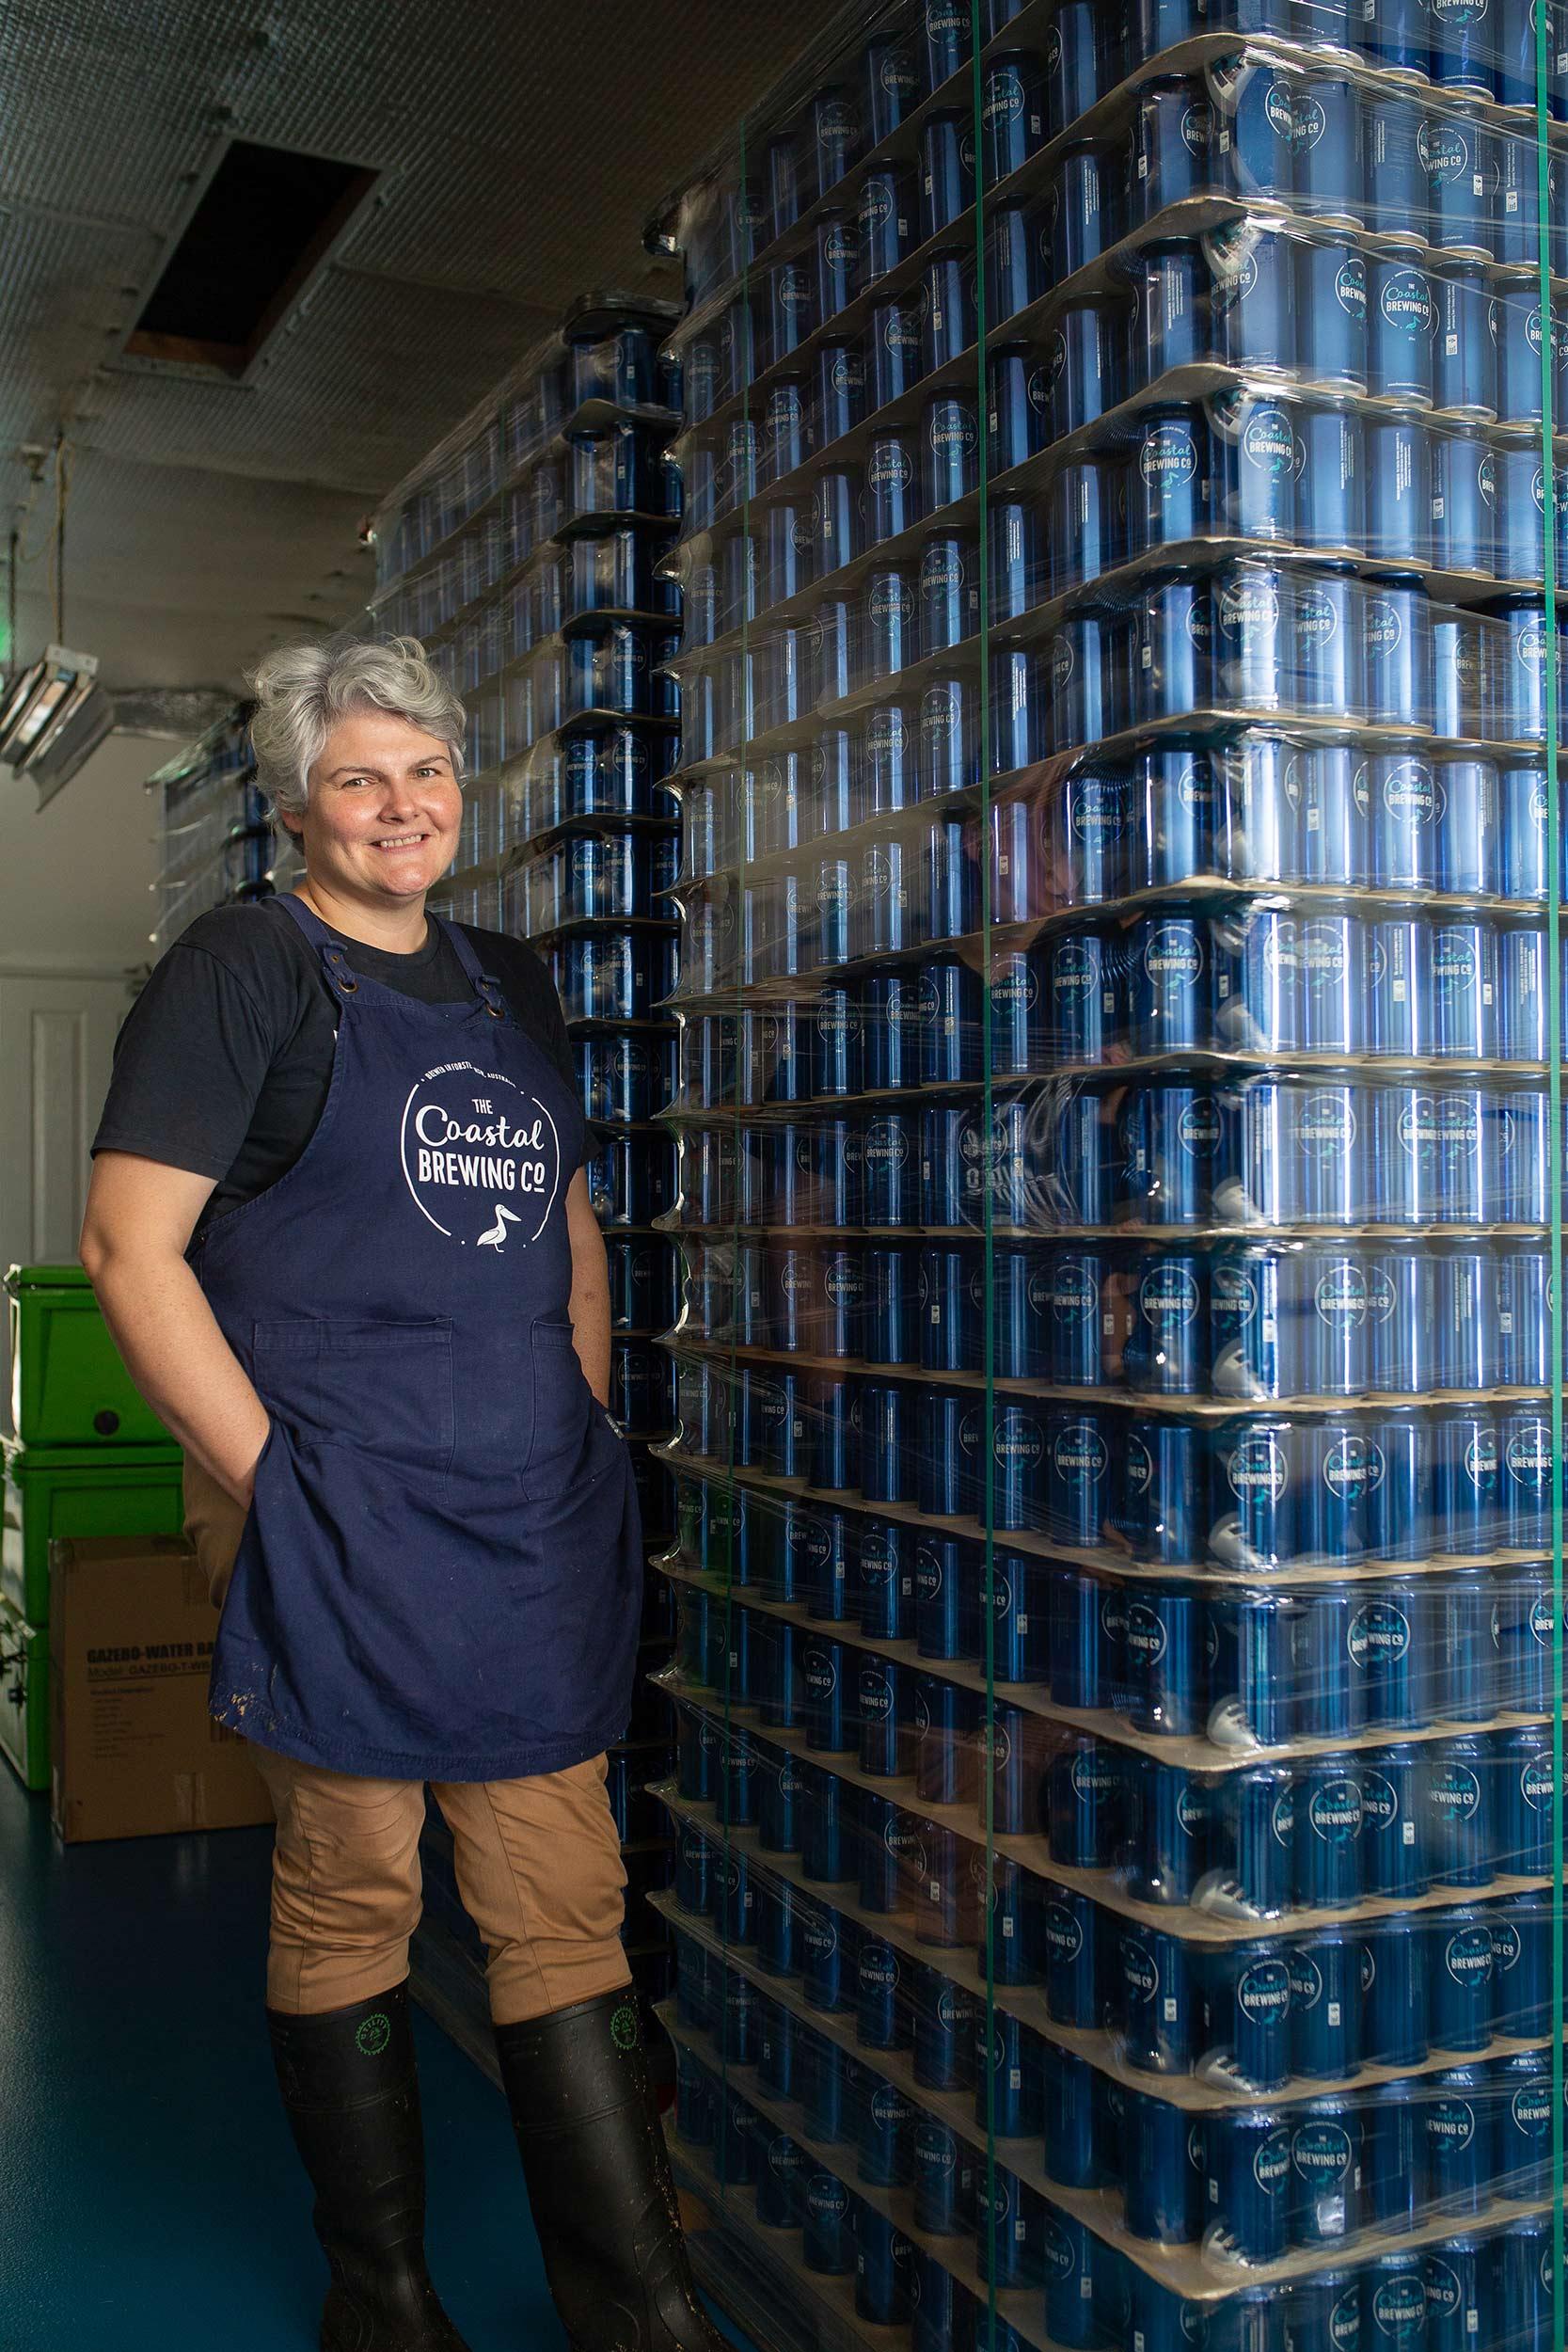 glft-coastal-brewing-helen.jpg